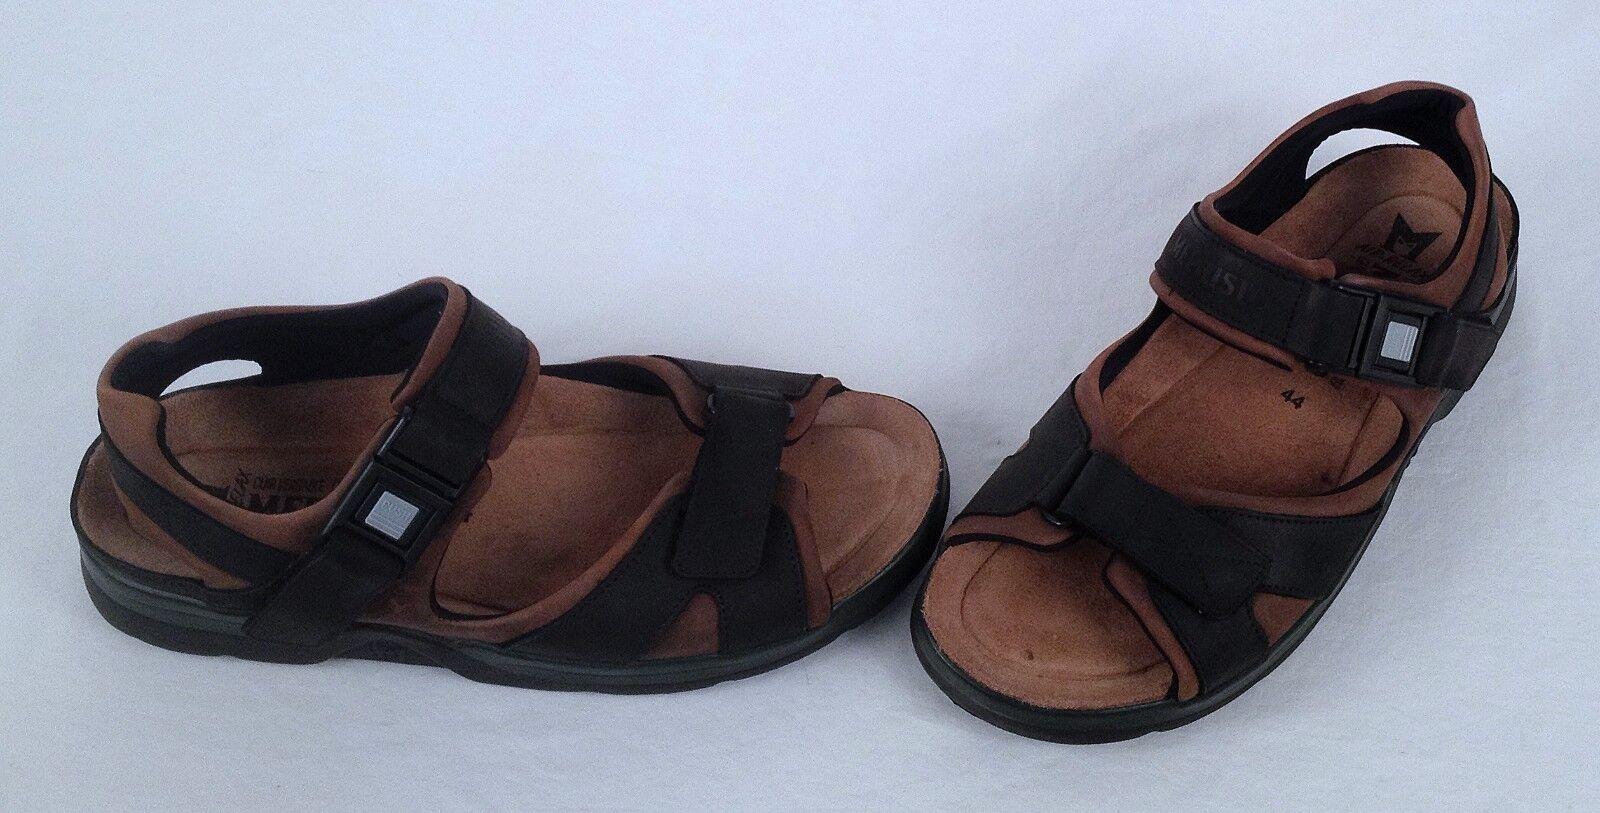 Mephisto 'Shark' Sandal- Black- Size 11 US  44 EU  (M4)